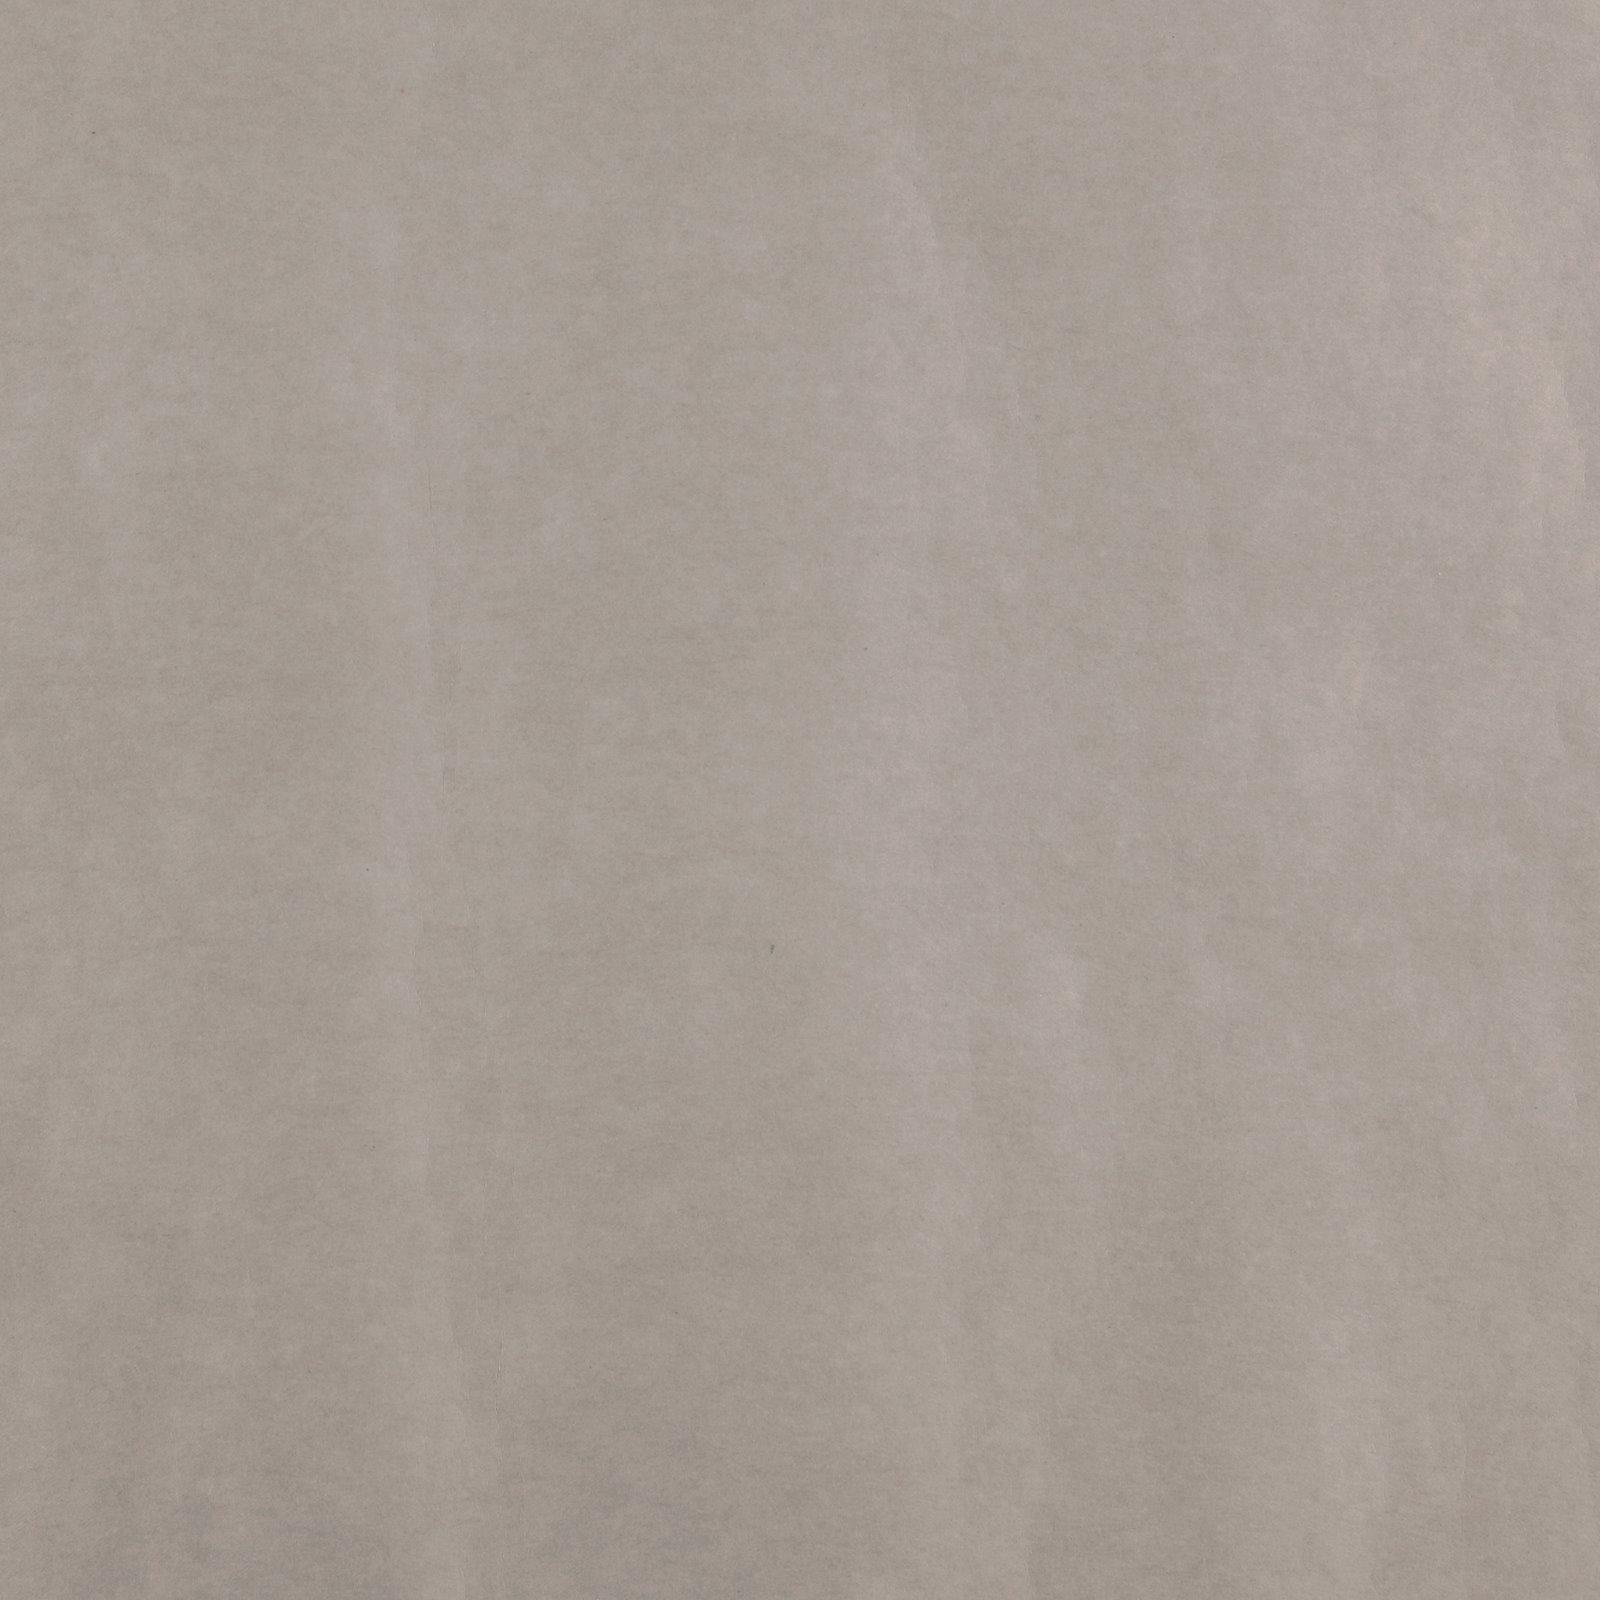 PAP FAB Grau, 75x100 cm